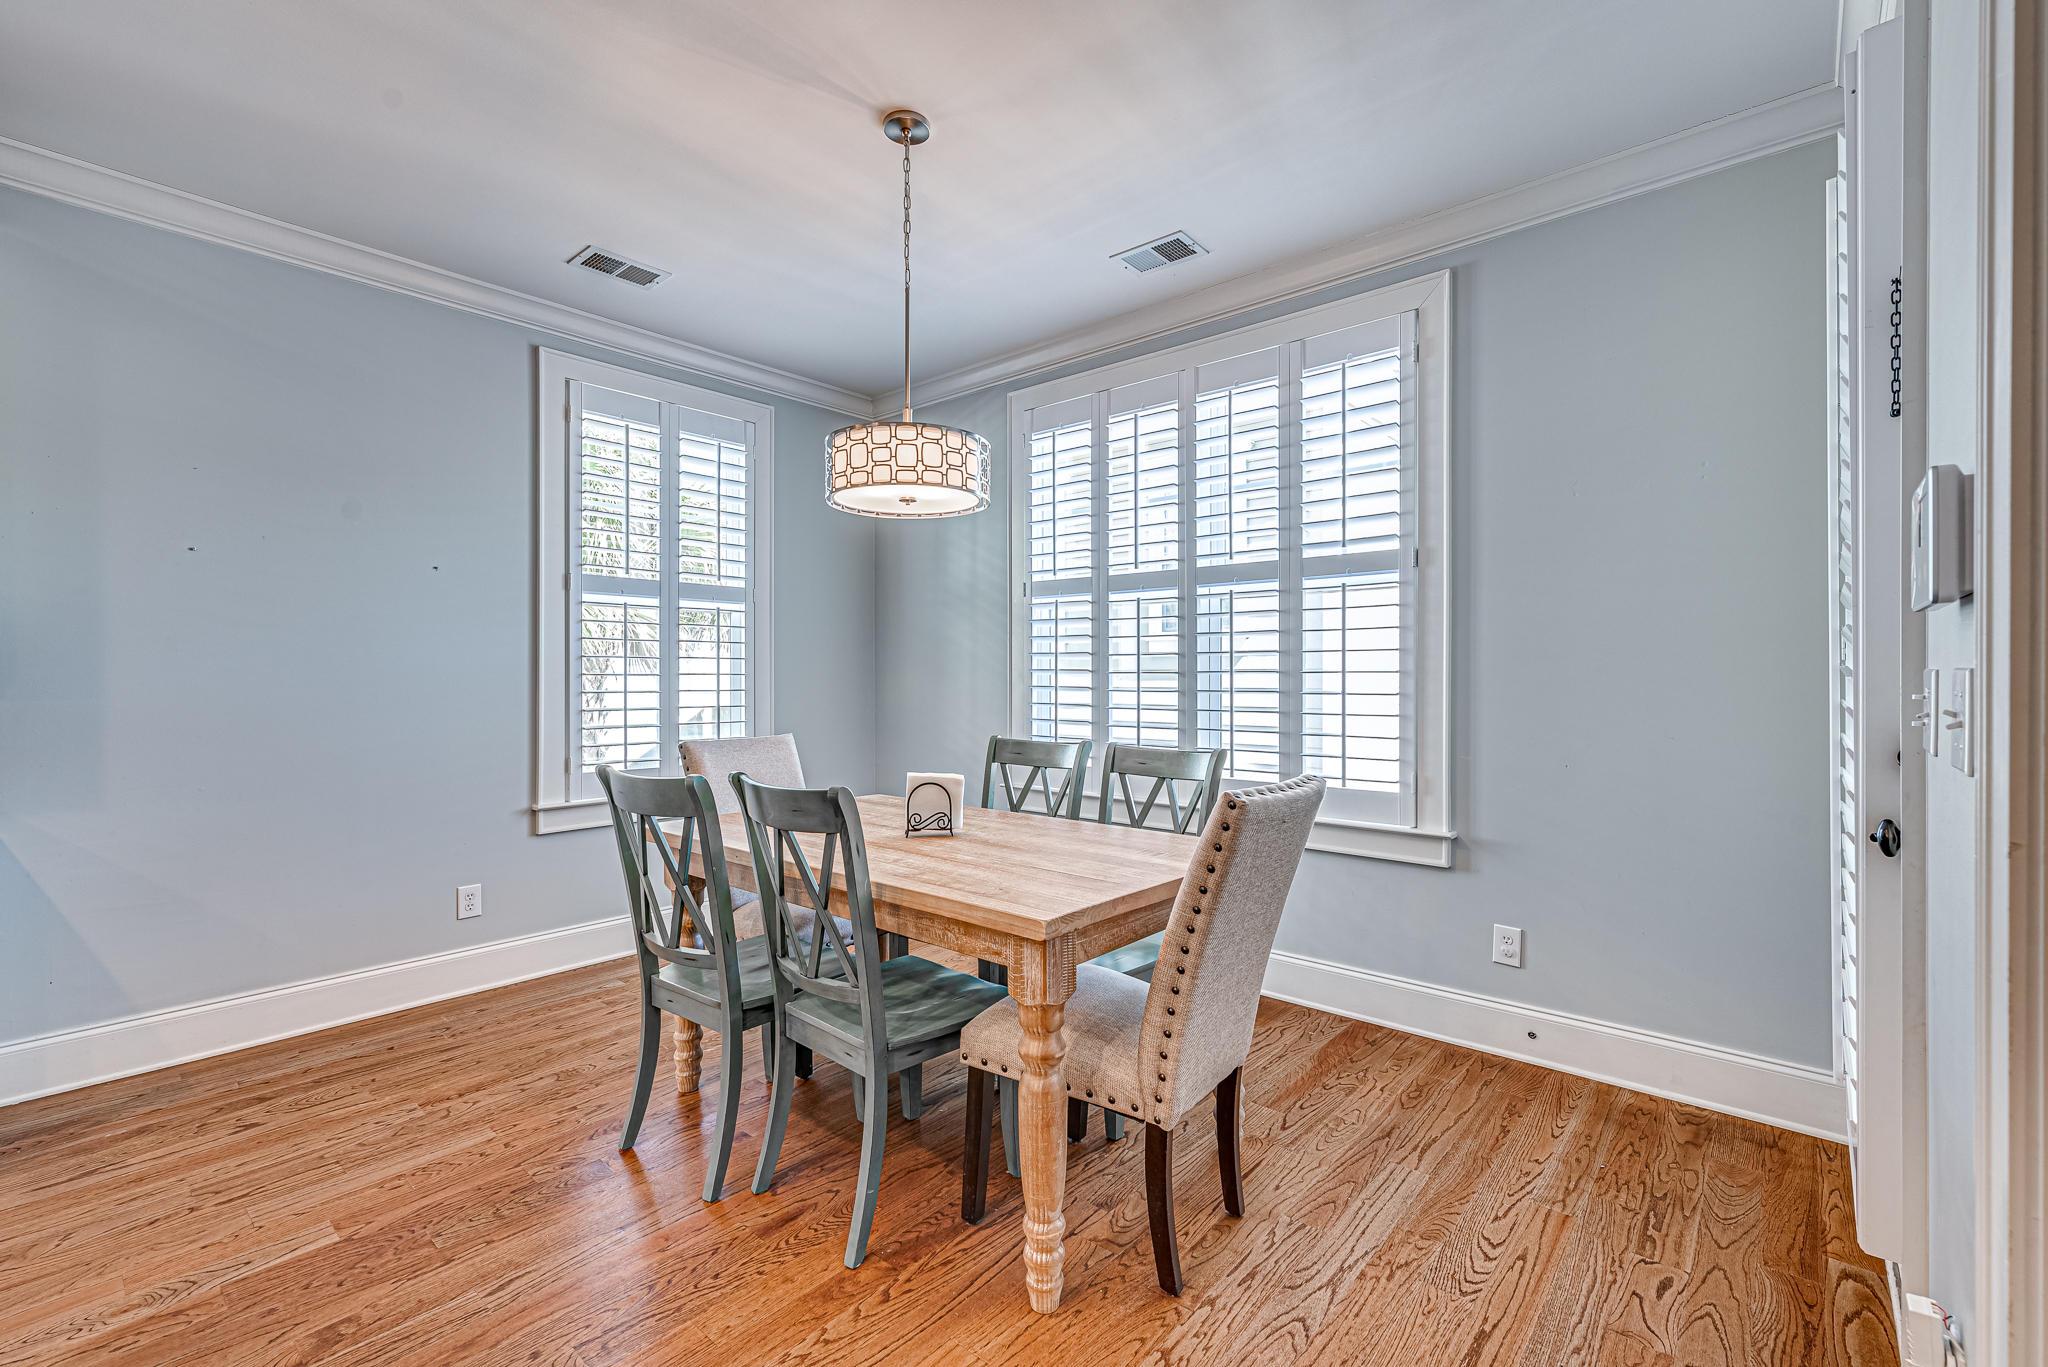 Daniel Island Smythe Park Homes For Sale - 1410 Wando View, Charleston, SC - 22